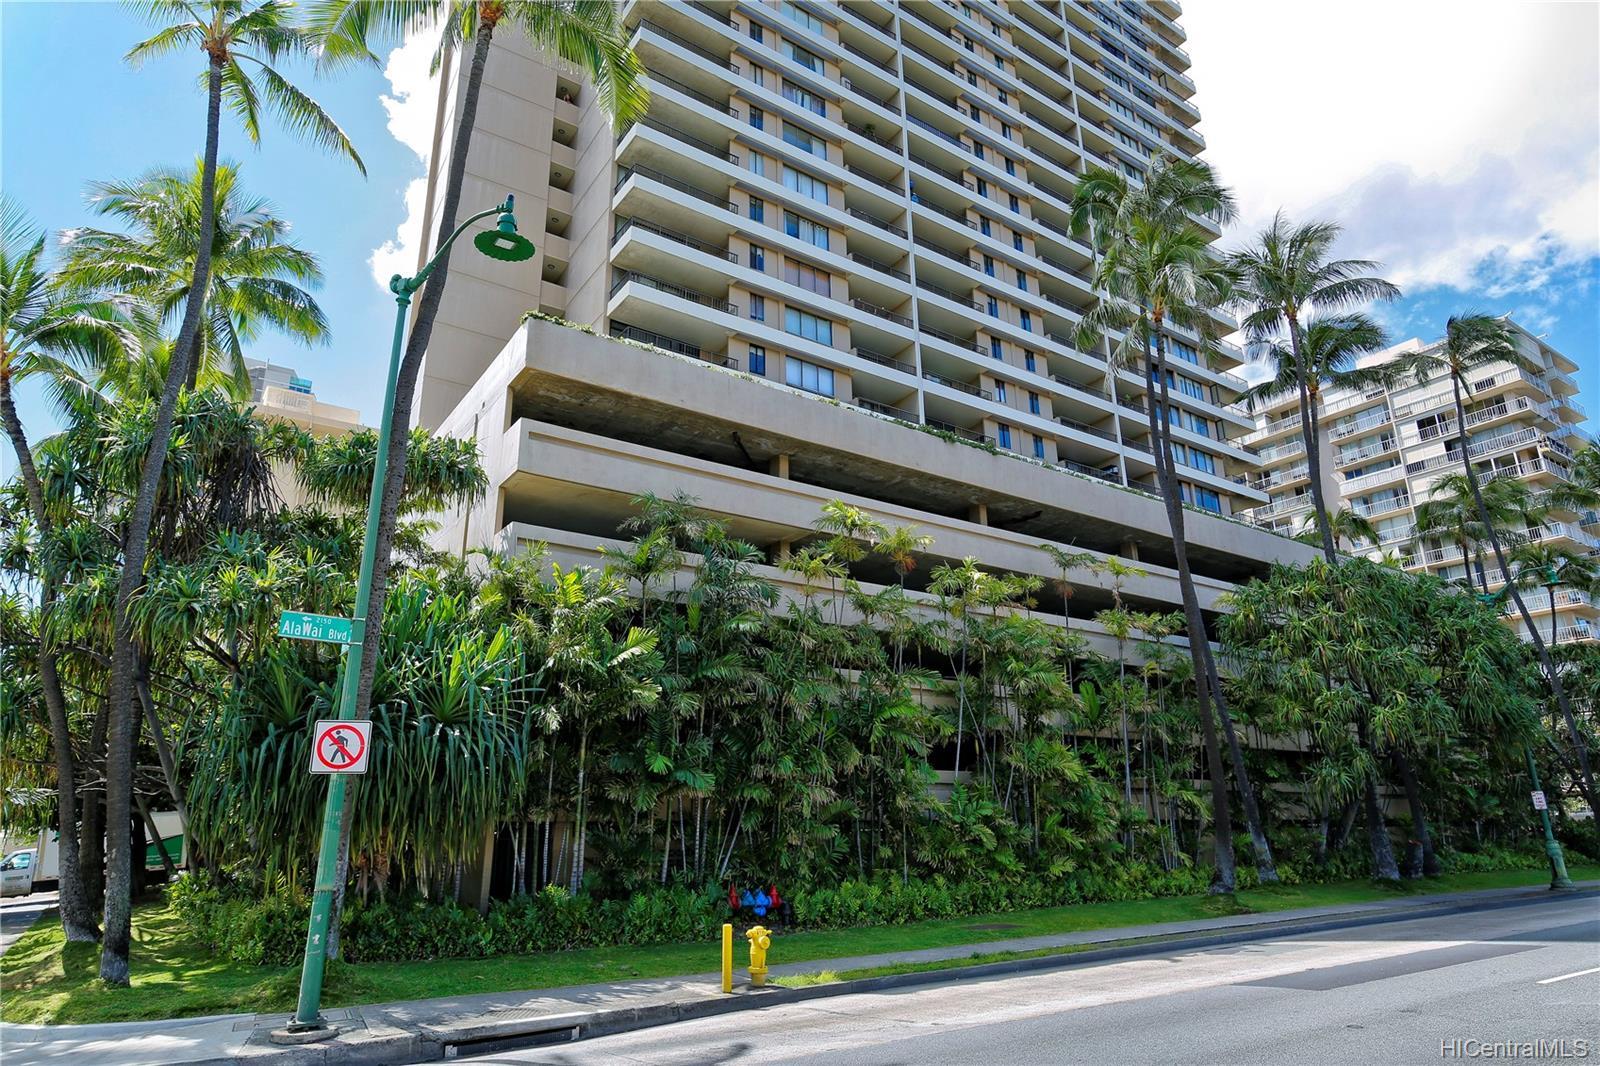 2121 Ala Wai Blvd Honolulu - Rental - photo 16 of 16